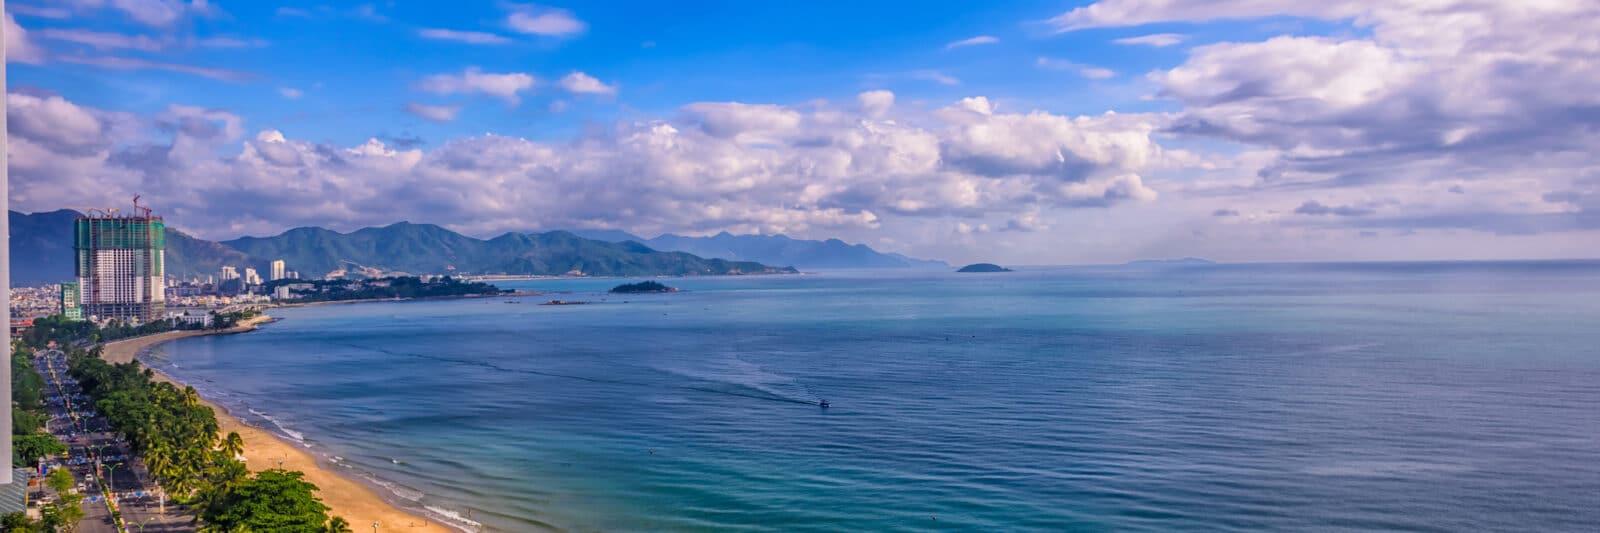 Khanh Hoa Vietnam Coastline